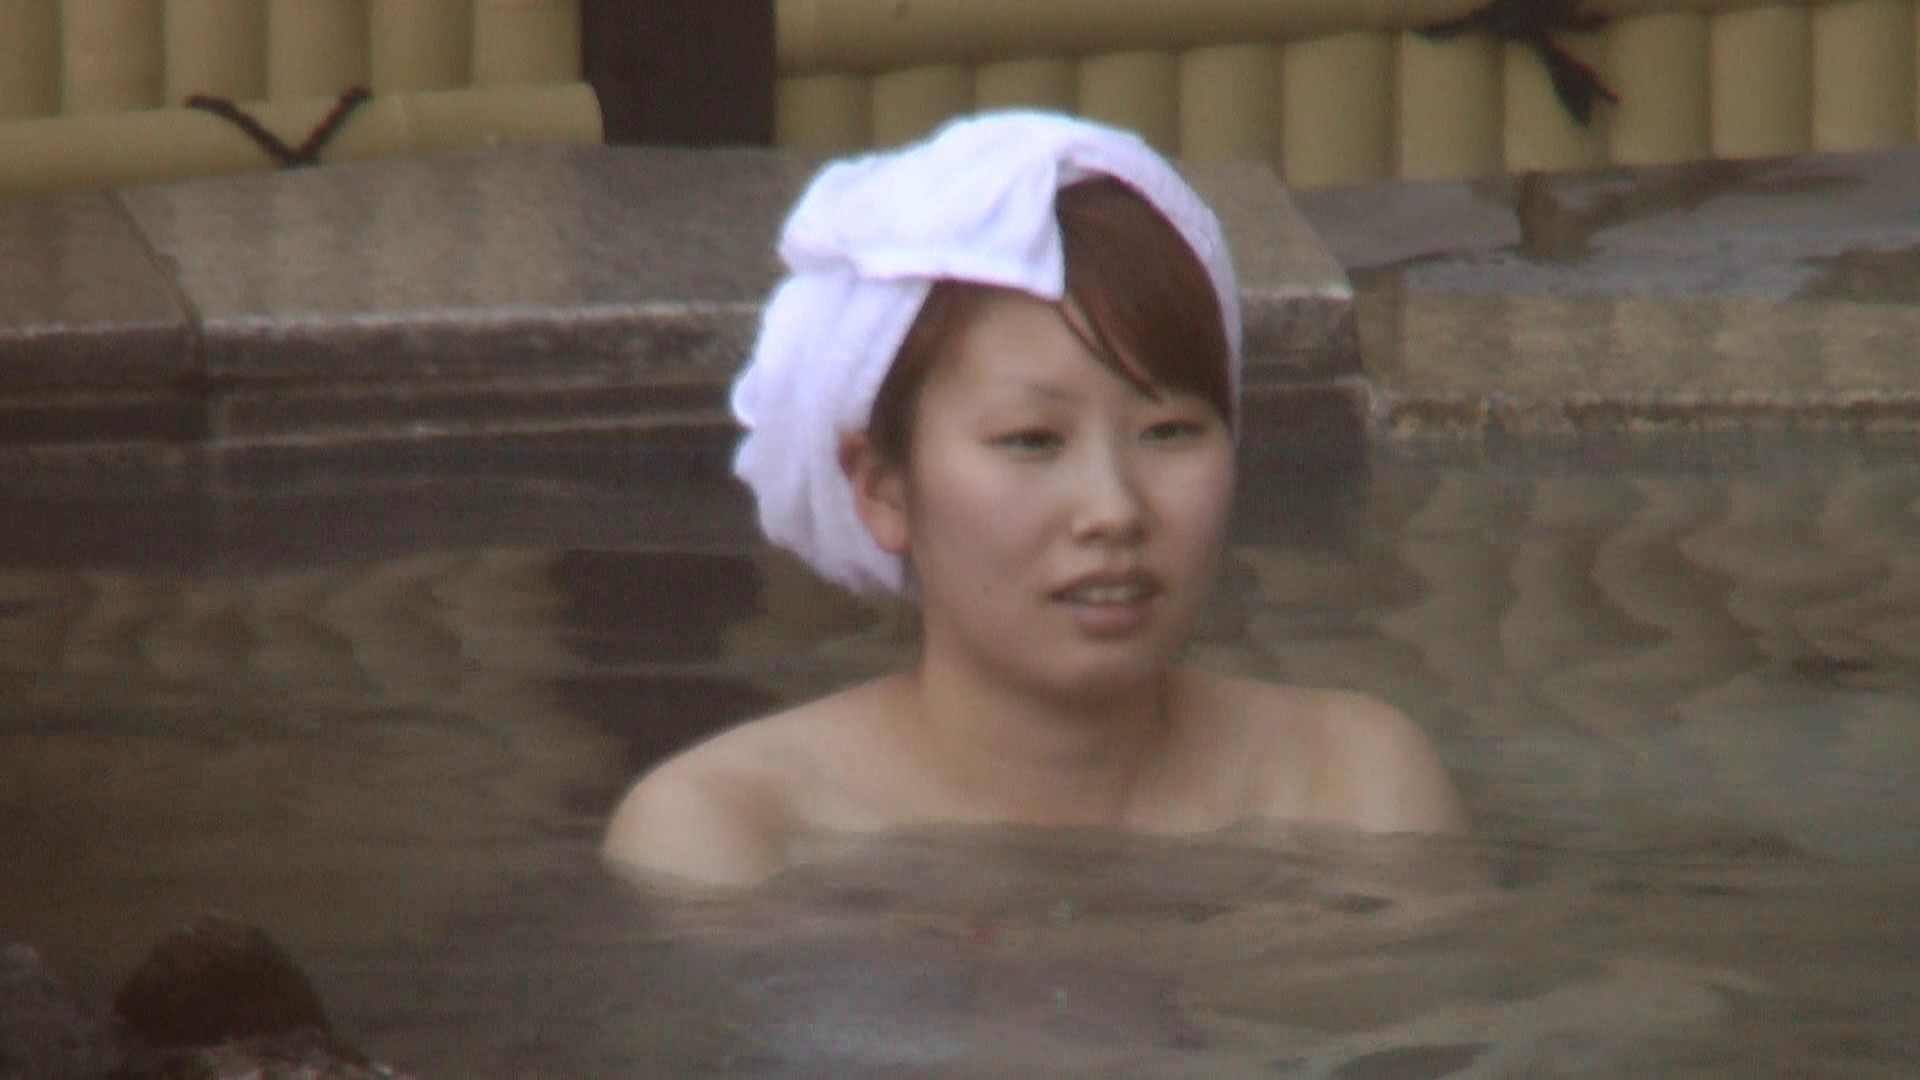 Aquaな露天風呂Vol.210 露天風呂編  86PIX 46